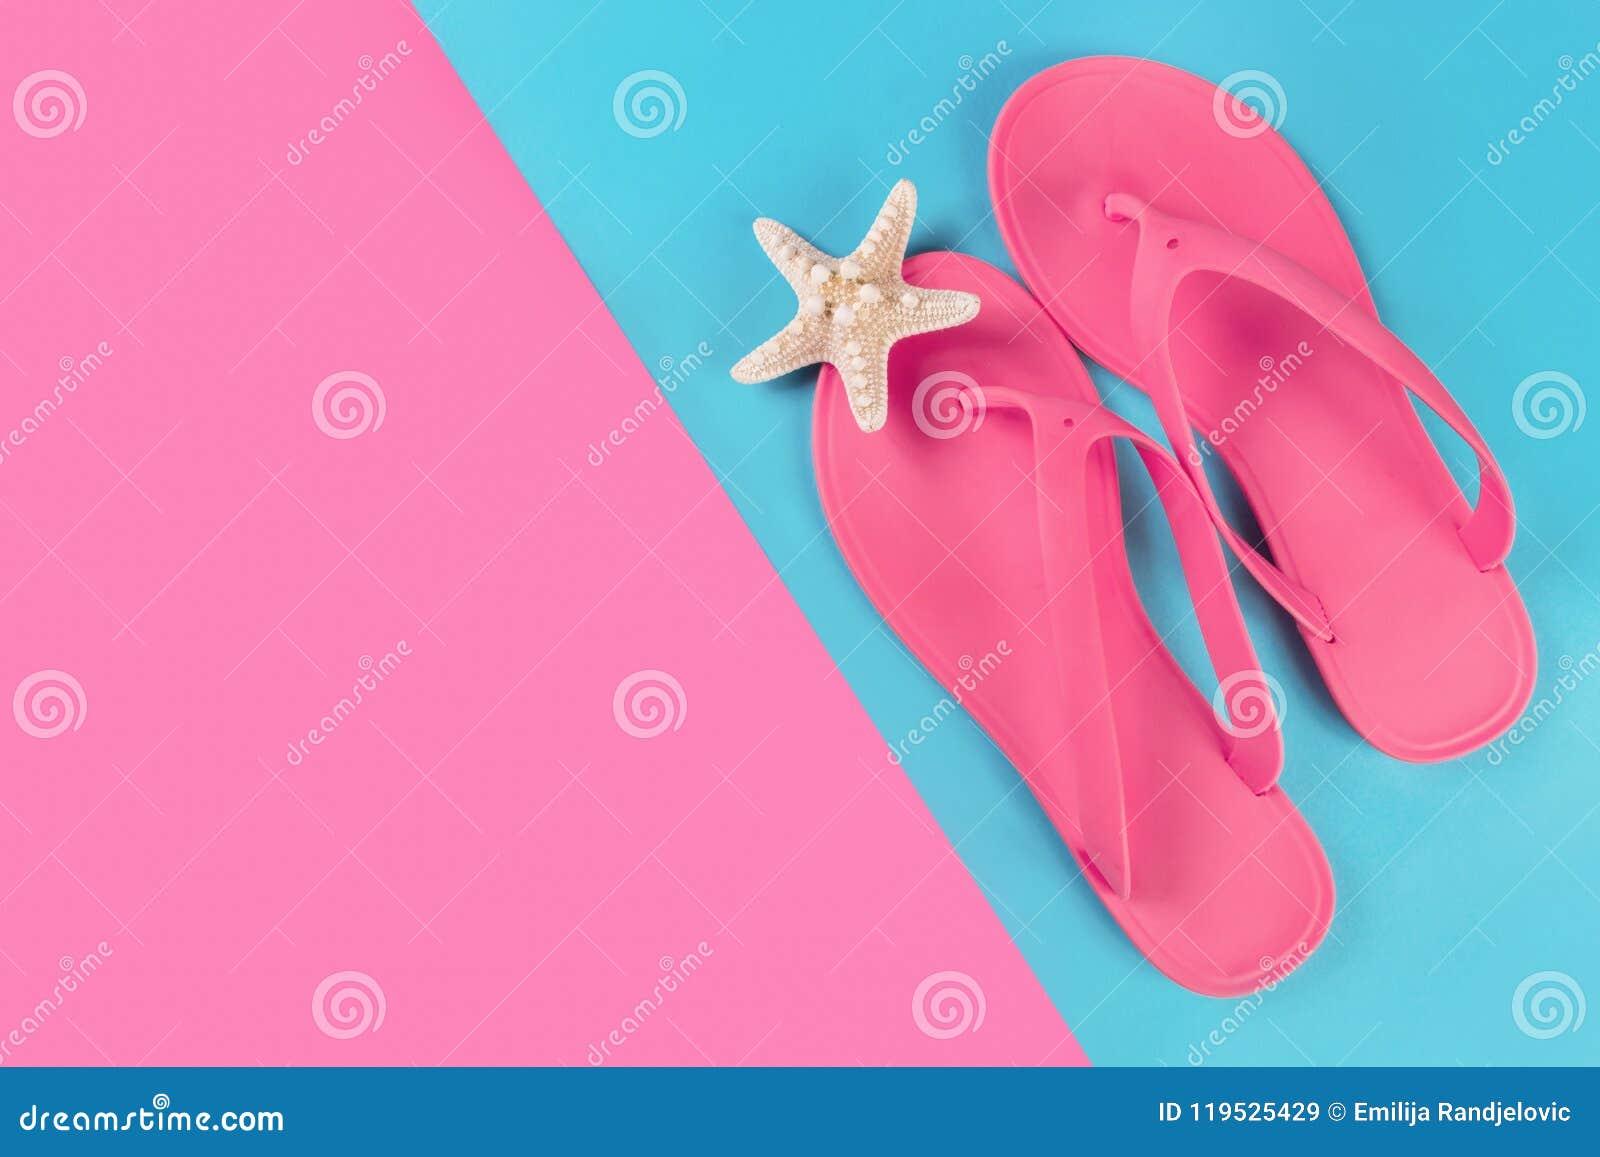 557887ffc3e7 pink-sandal-flip-flops-starfish-blue-pink -abstract-pastel-background-femininity-girl-pink-sandal-flip-flops -119525429.jpg